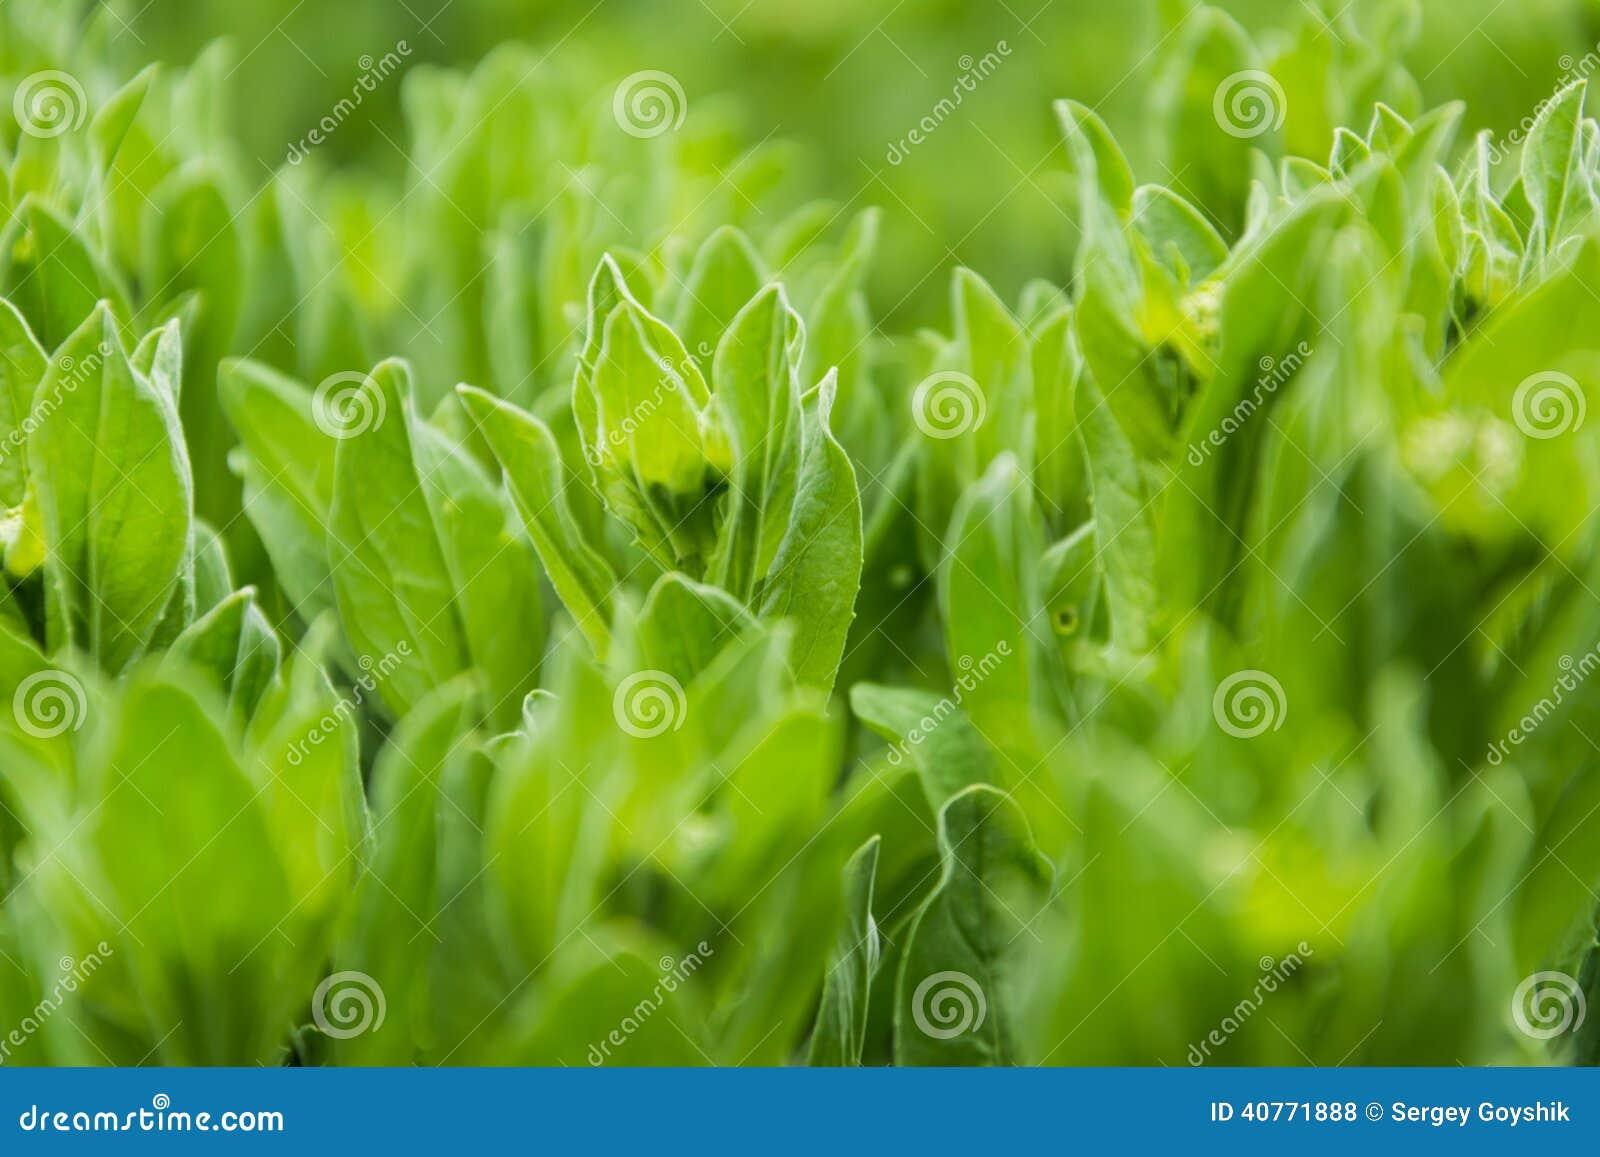 Green grass - wild lettuce